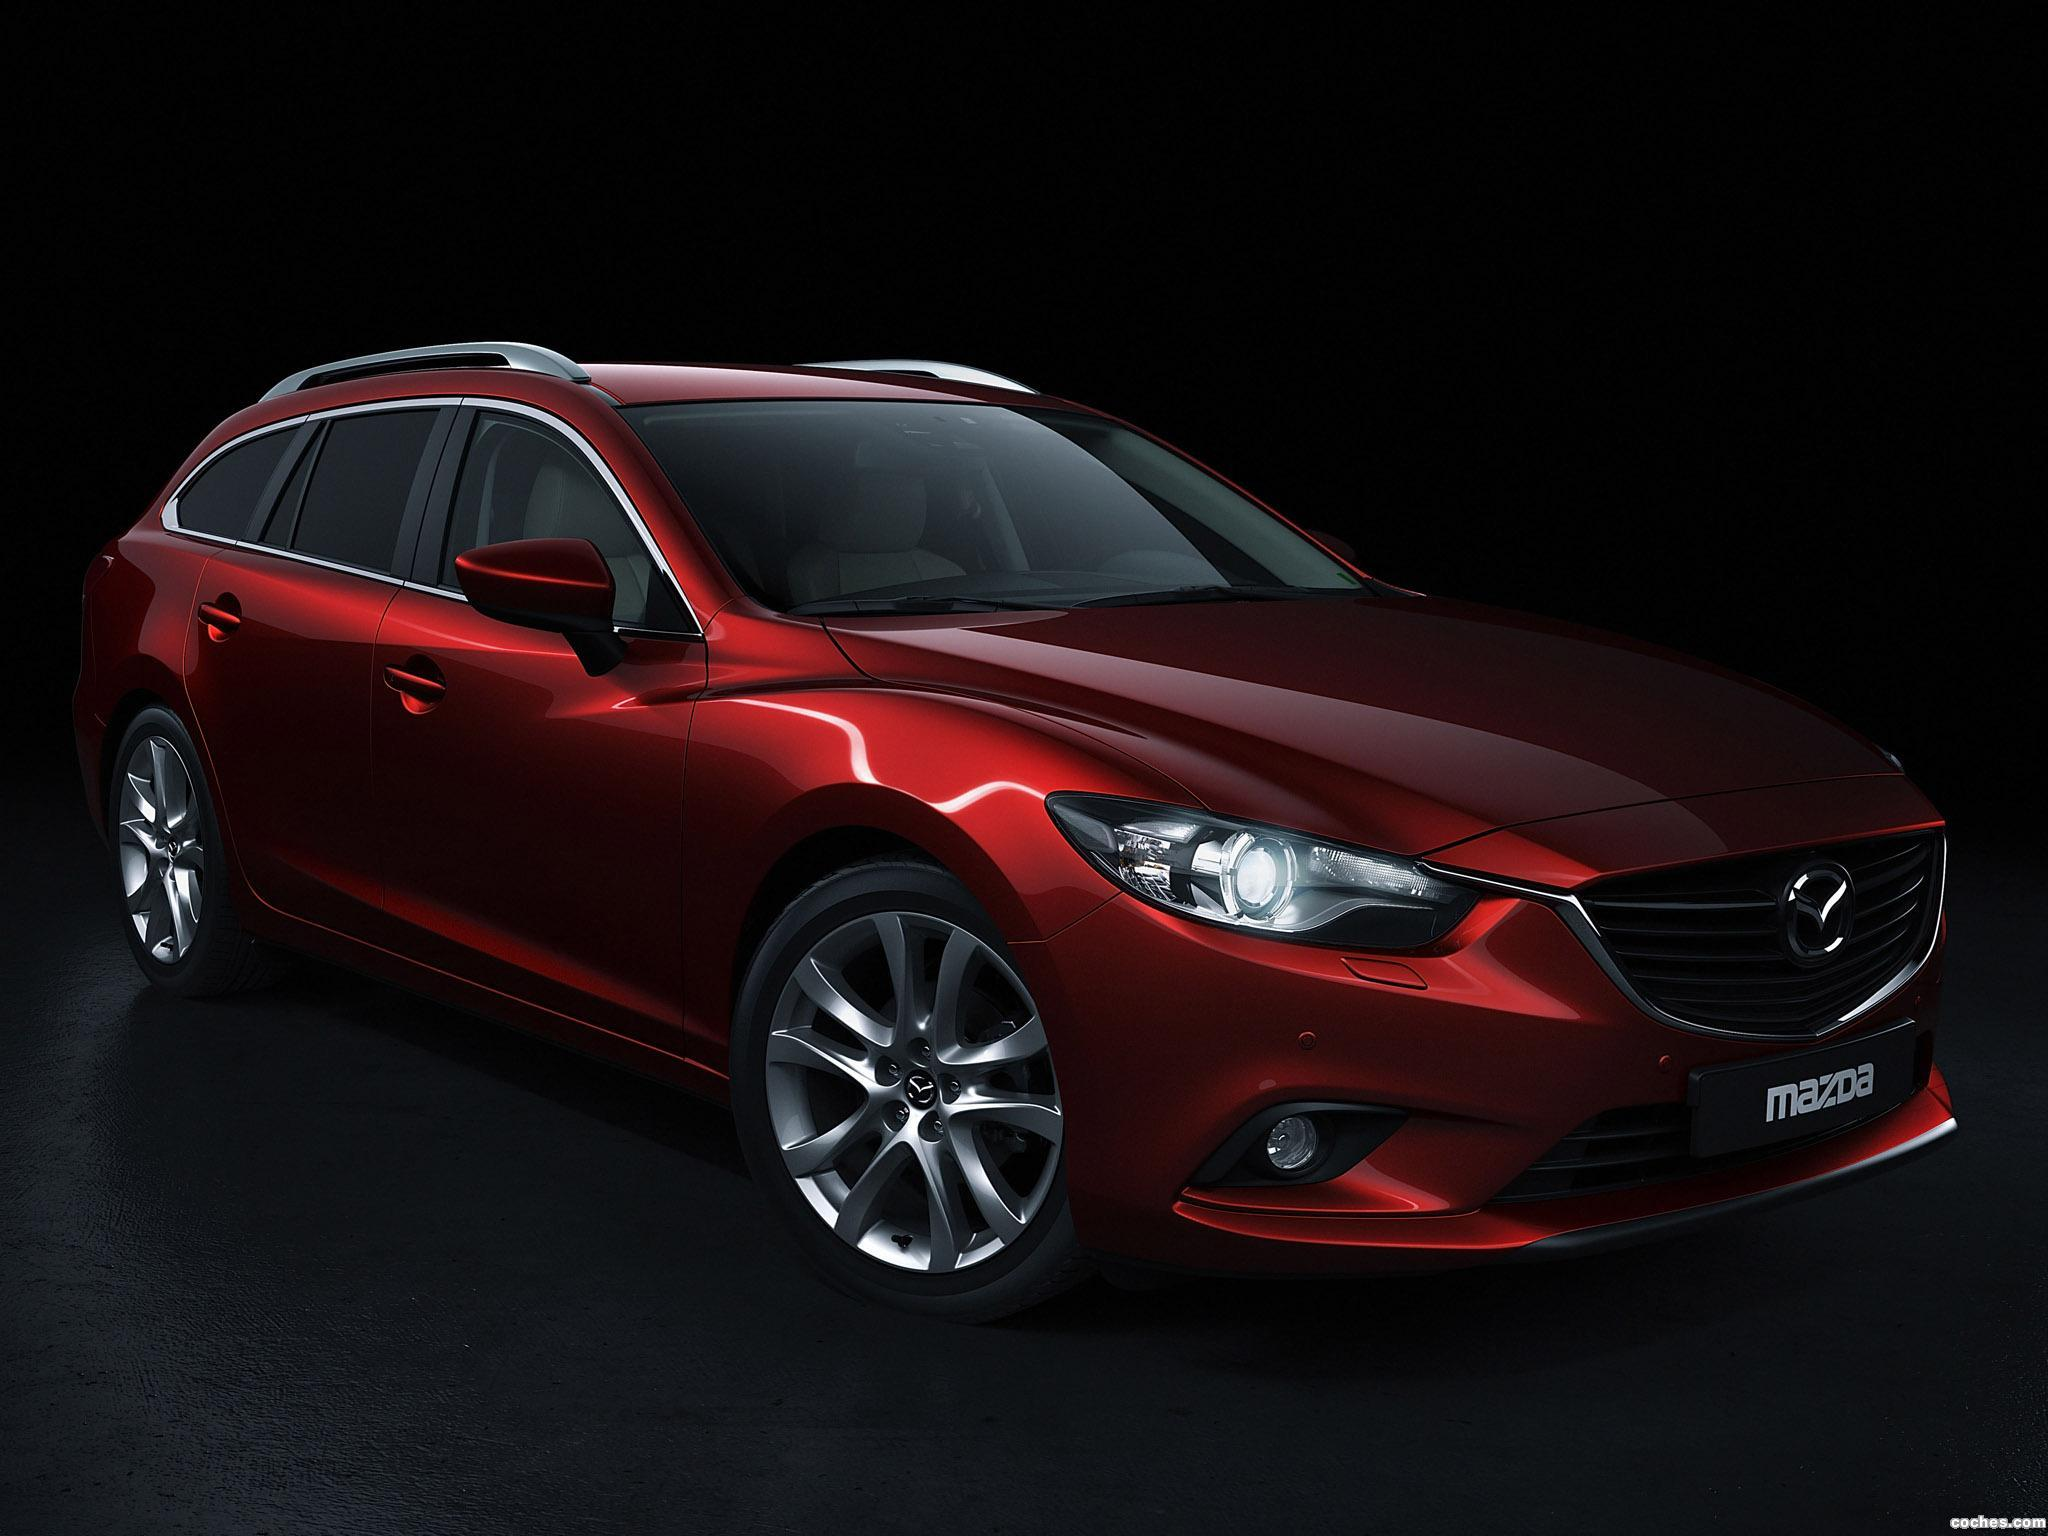 Foto 17 de Mazda 6 Wagon 2013